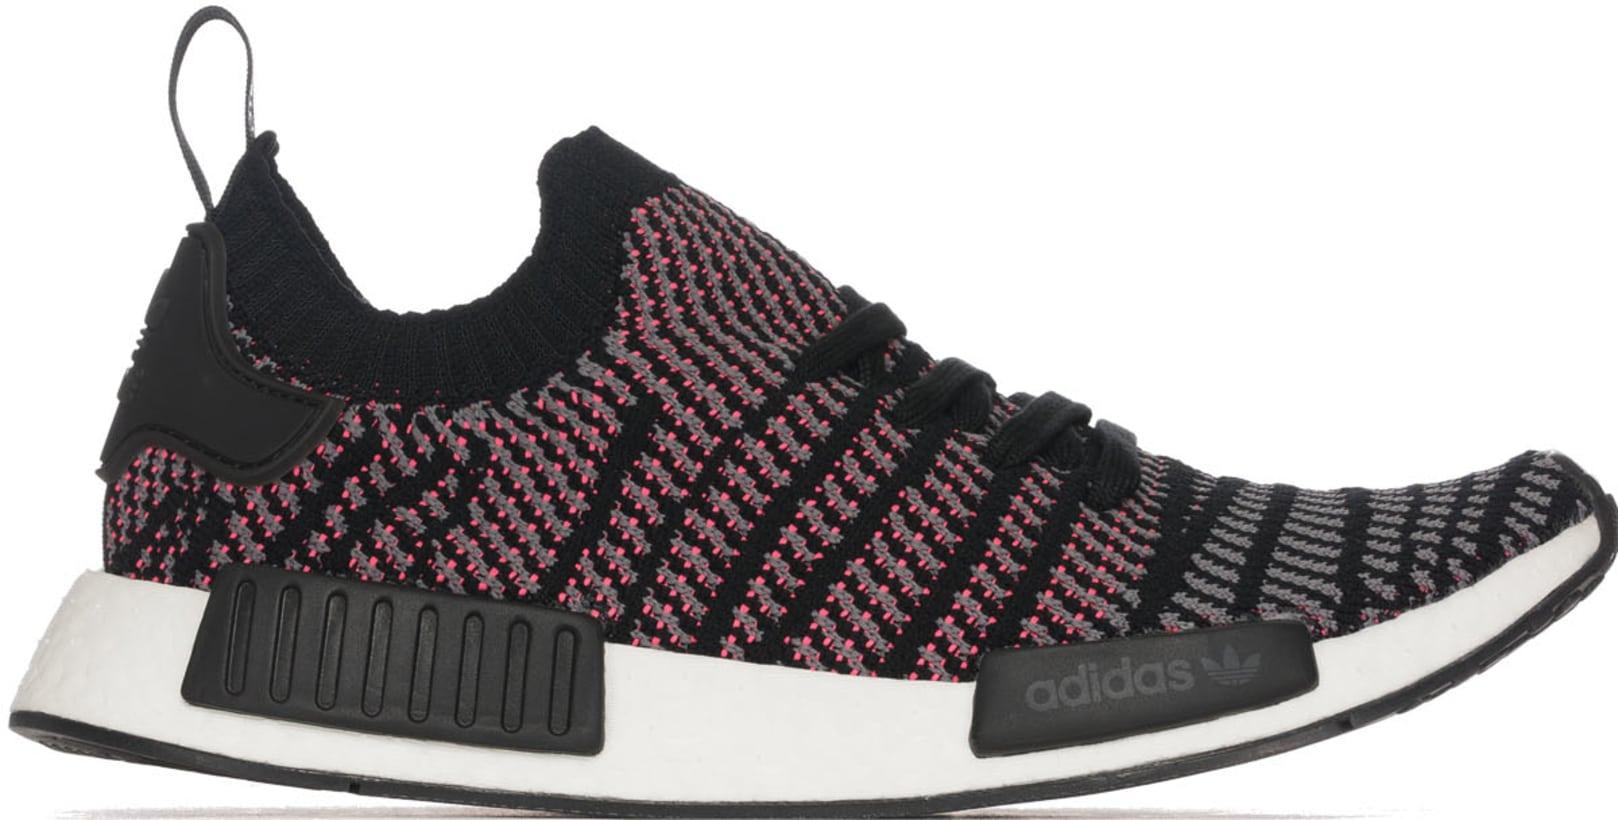 cdb0da2c86560 adidas Originals  NMD R1 STLT Primeknit - Core Black Grey Solar Pink ...